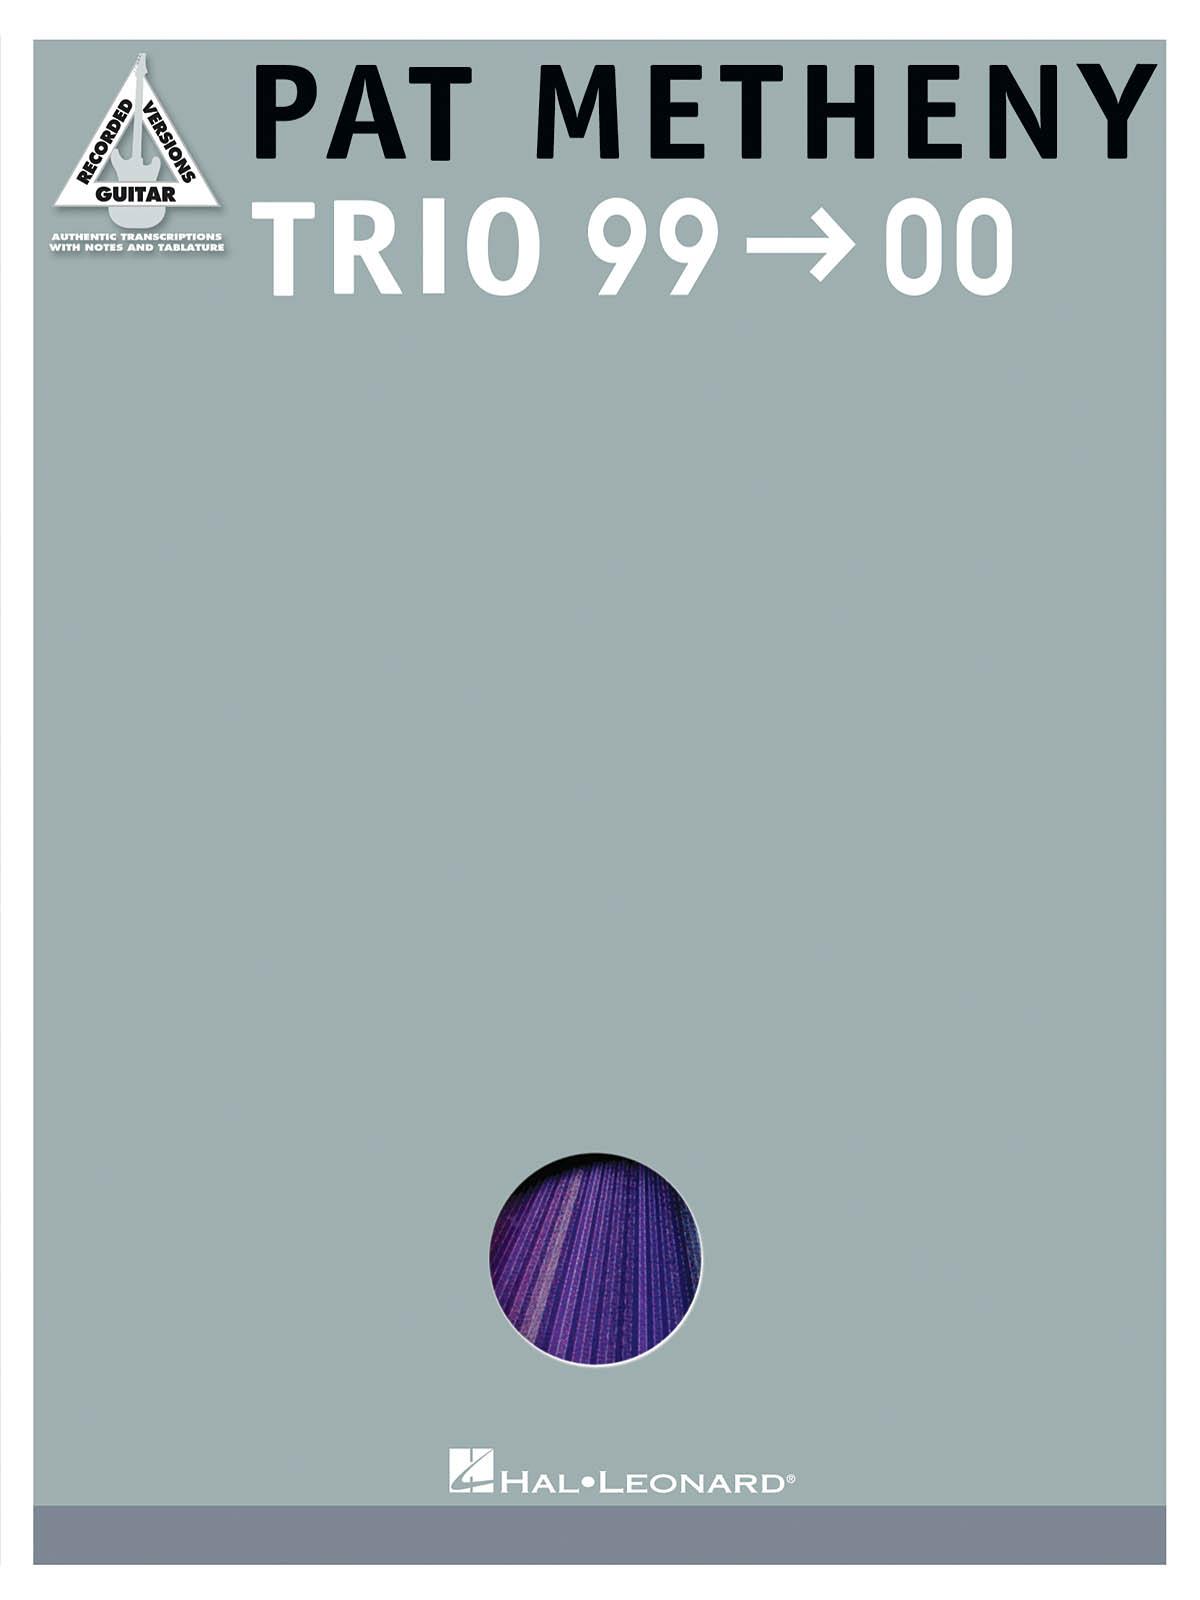 Pat Metheny: Pat Metheny - Trio 99-00: Guitar Solo: Album Songbook